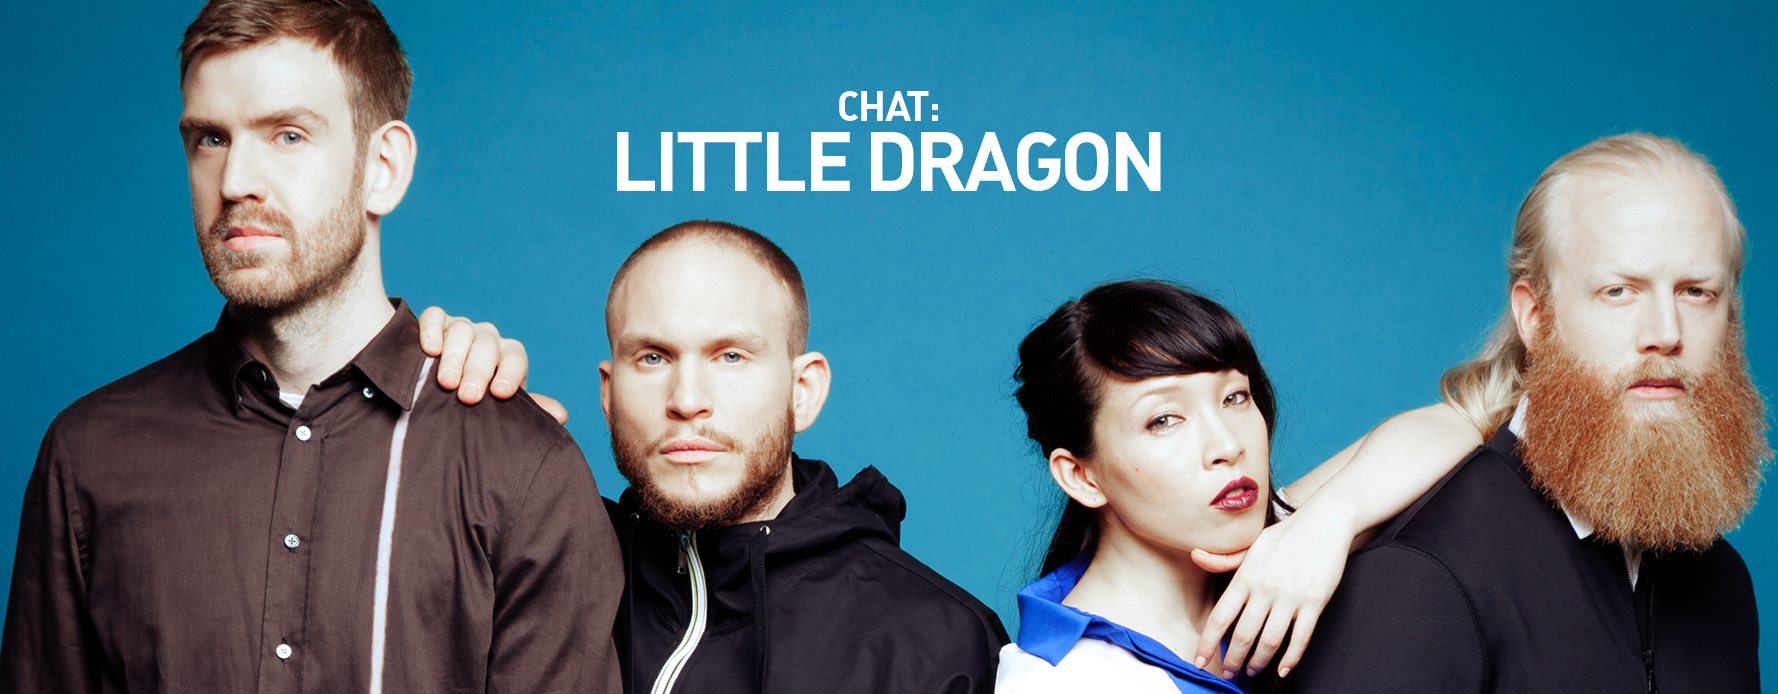 source: Little Dragon